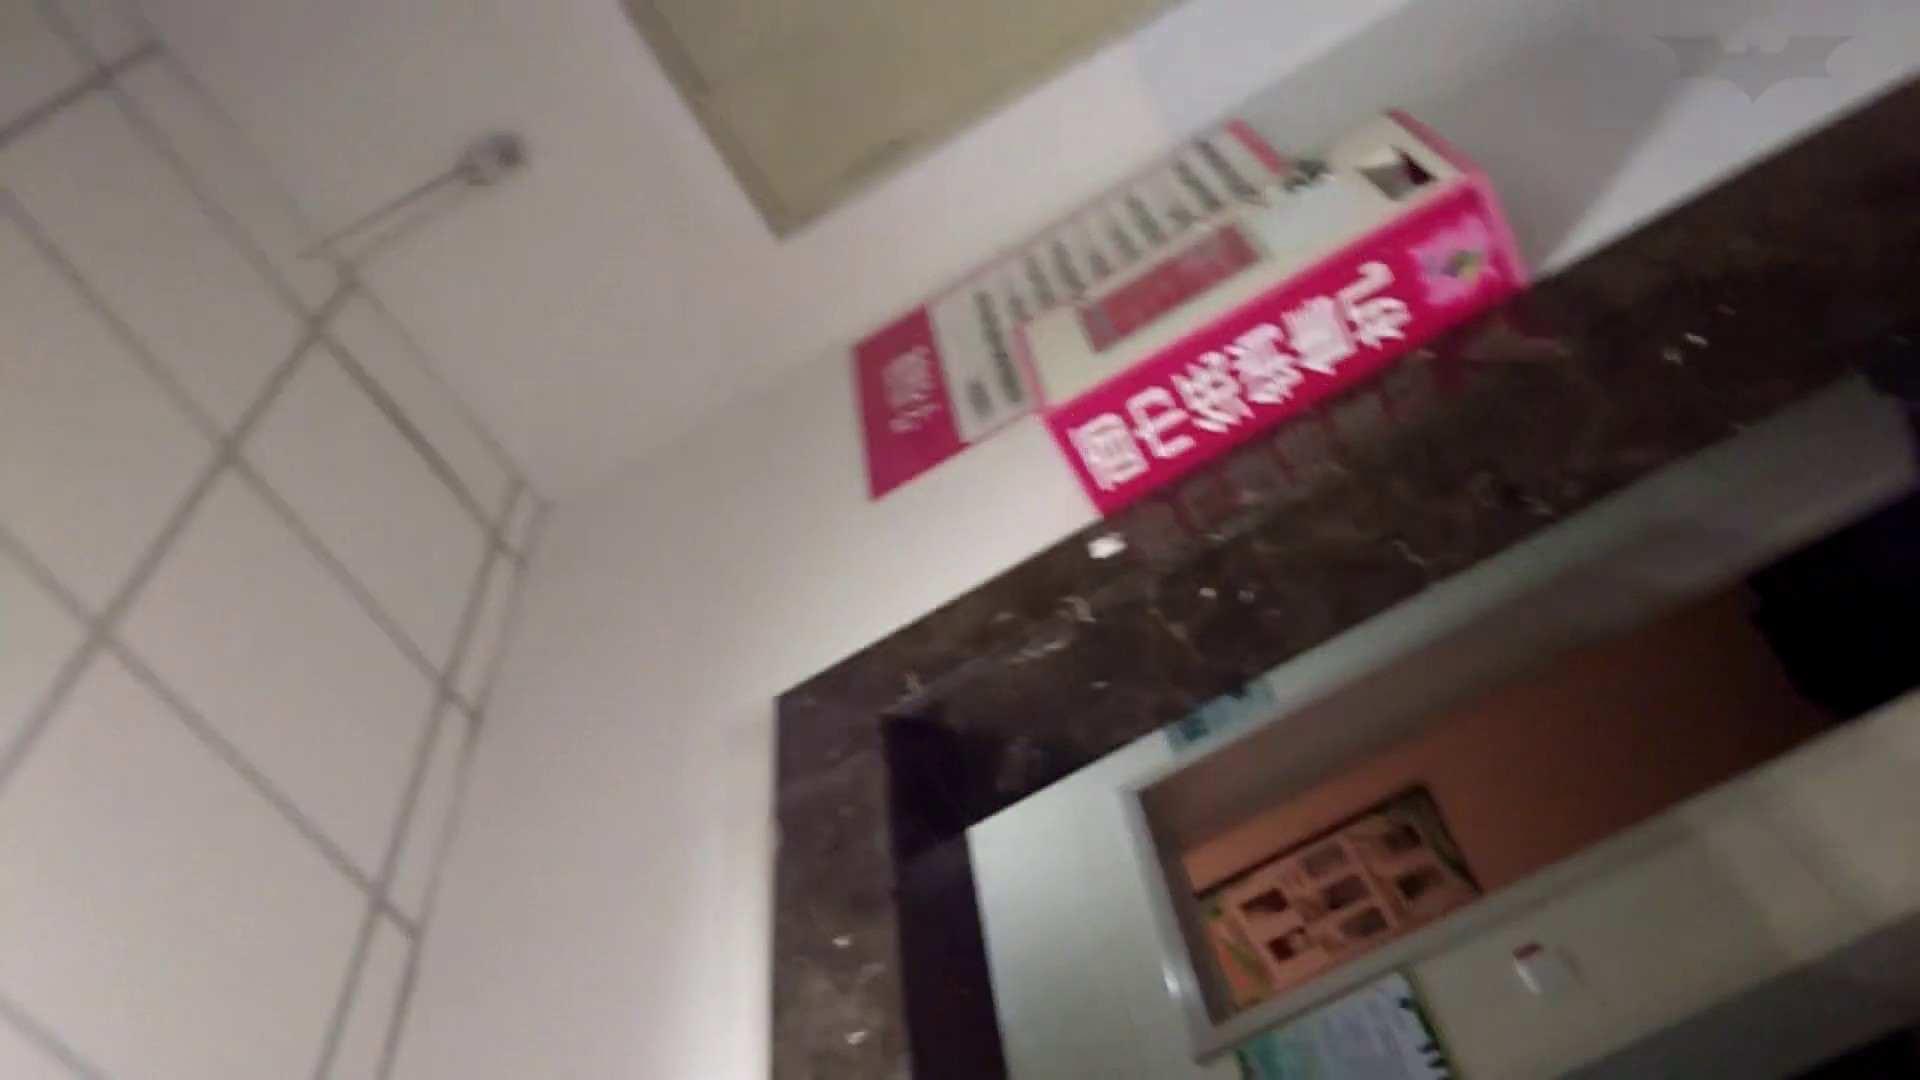 芸術大学ガチ潜入盗撮 JD盗撮 美女の洗面所の秘密 Vol.102 細身体型 エロ画像 99枚 90